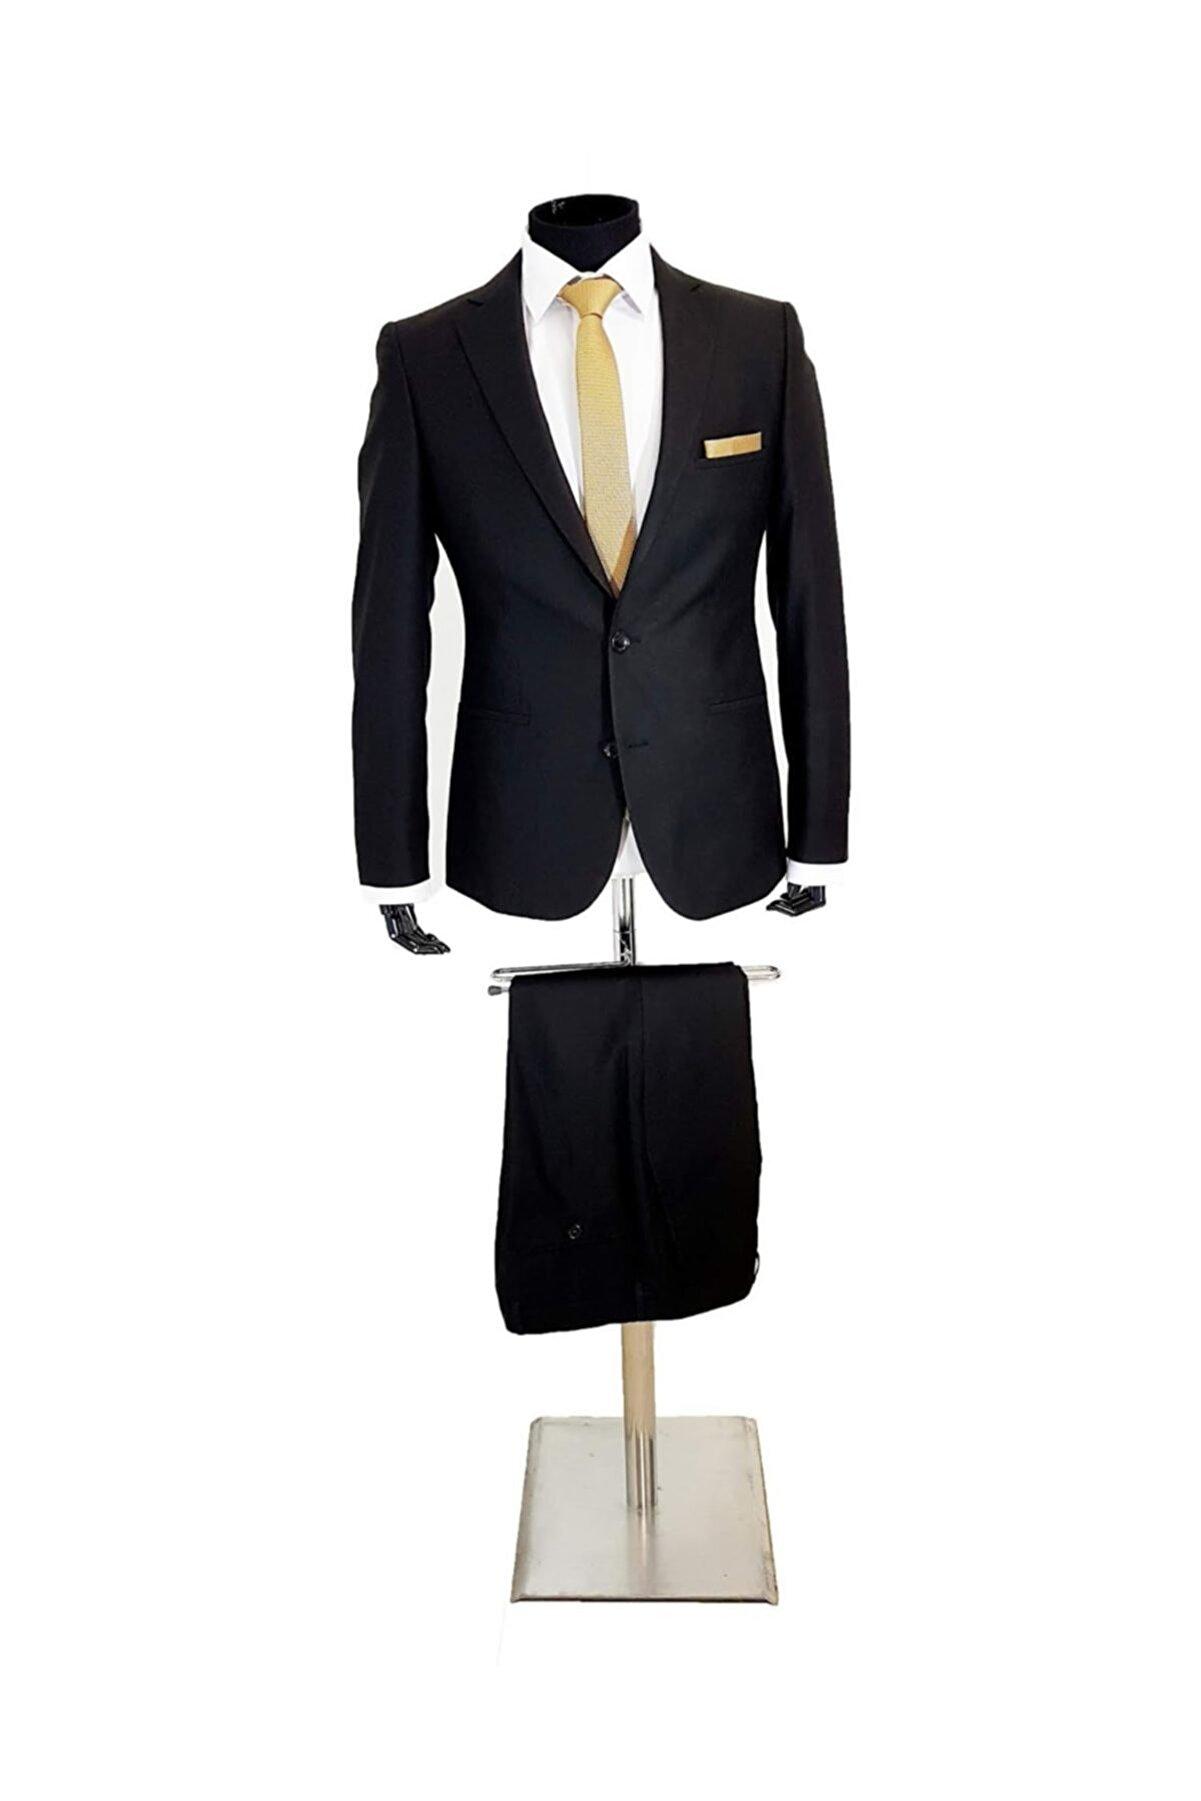 MENTOR REGALO Erkek Takım Elbise Siyah Slim Fit 41012